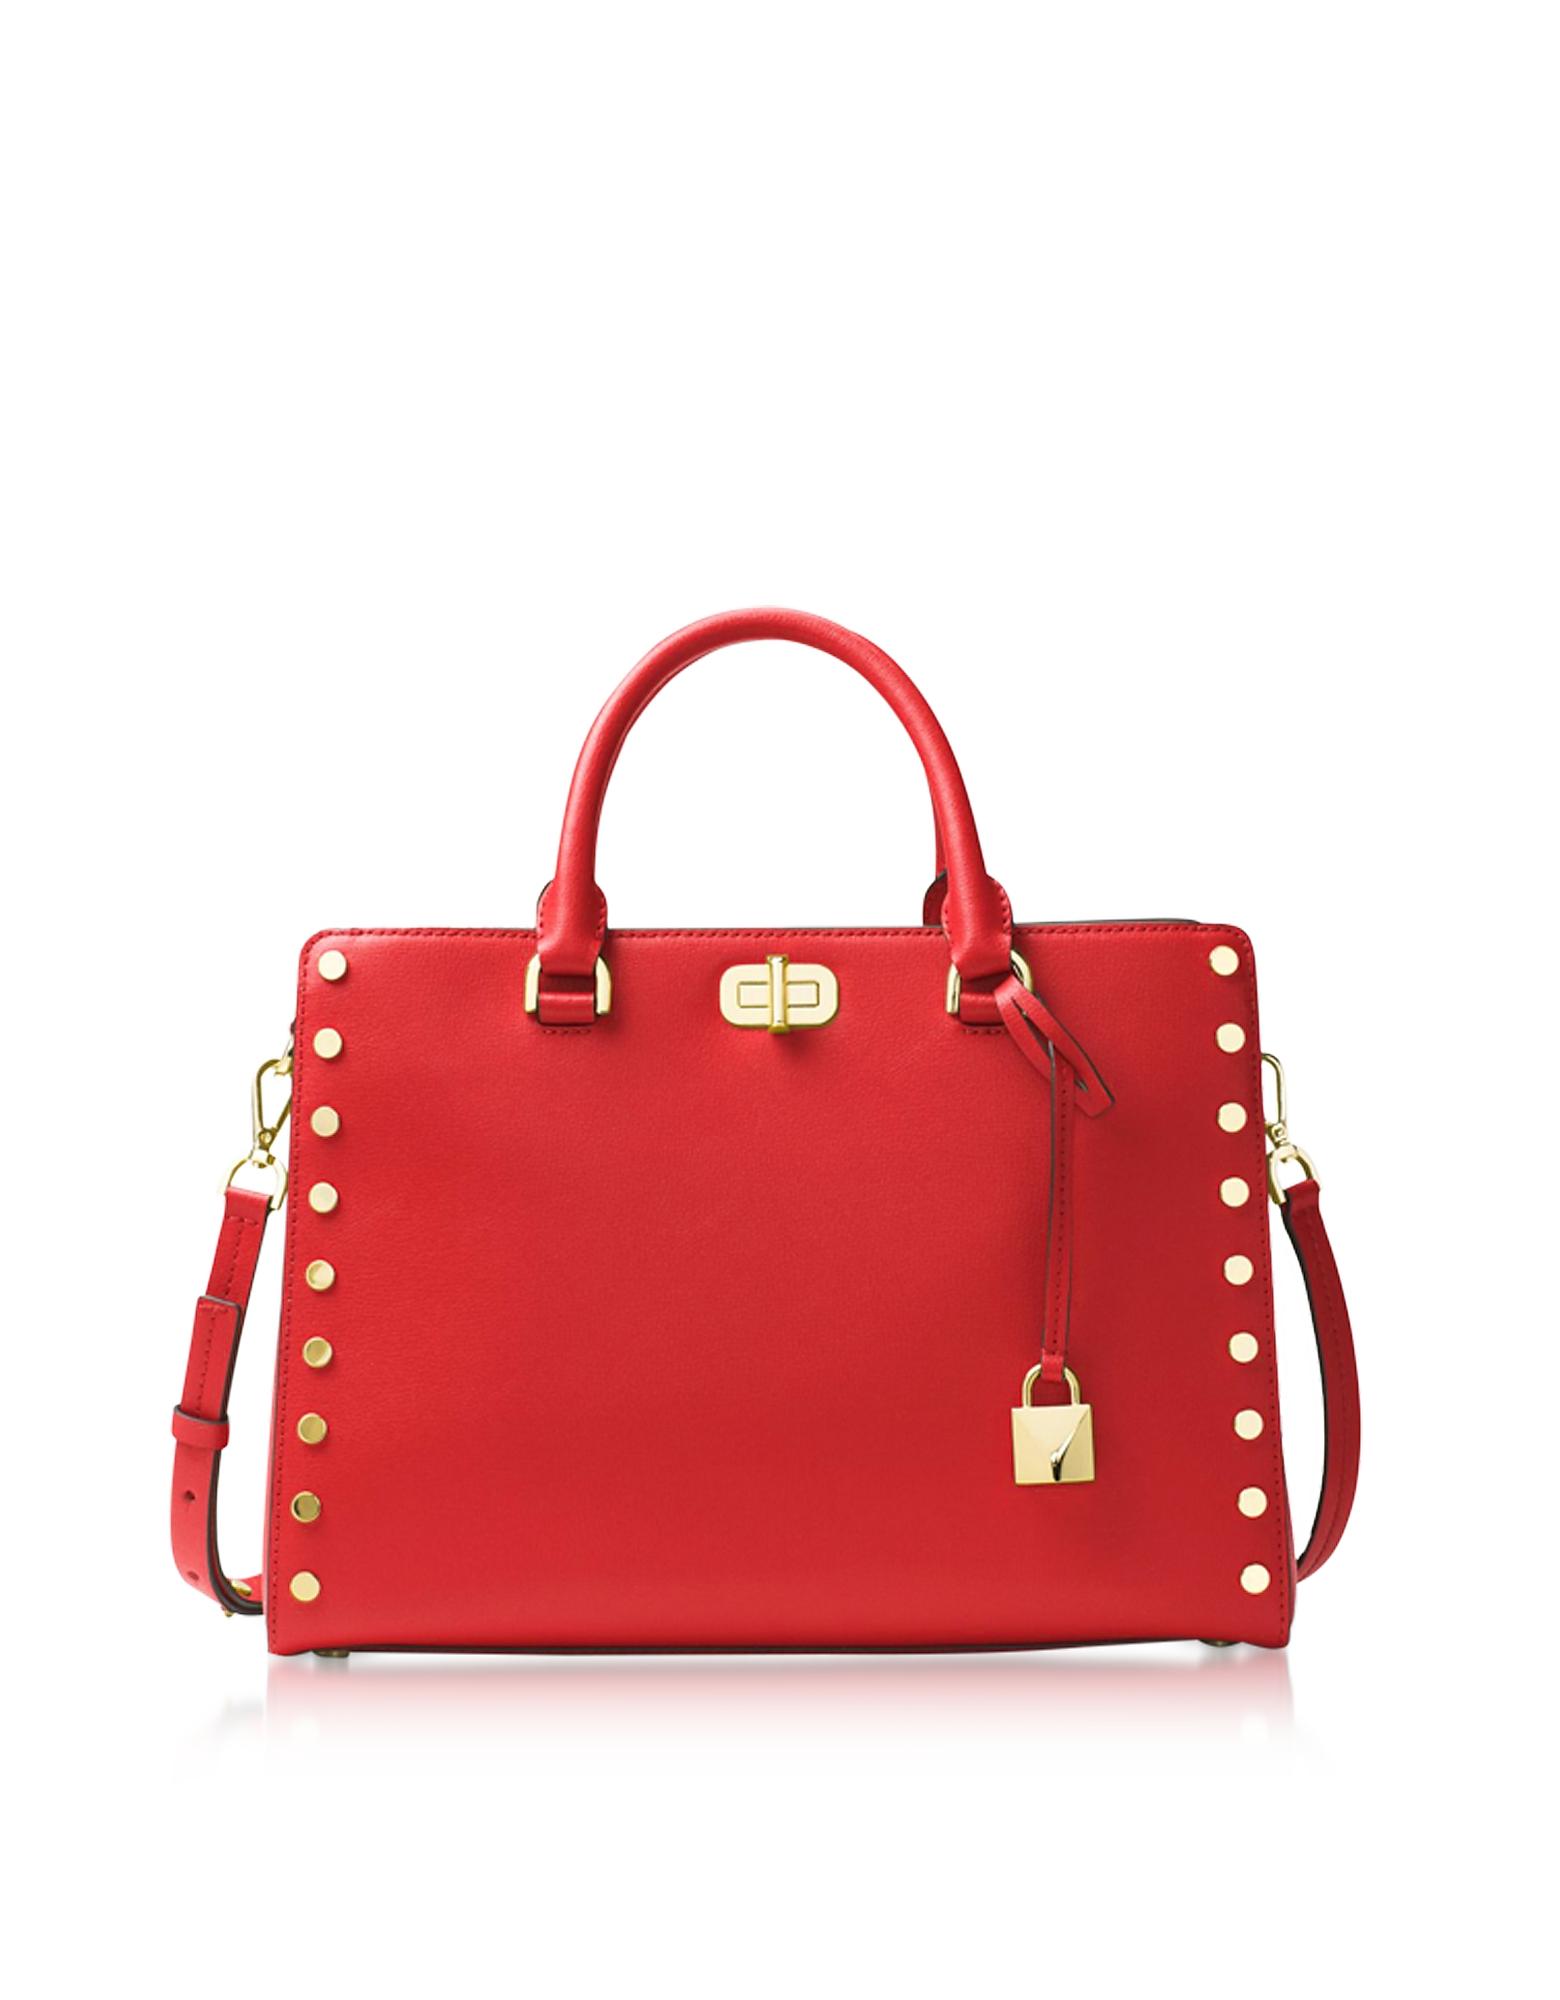 Michael Kors Handbags, Sylvie Stud Large Bright Red Leather Satchel Bag